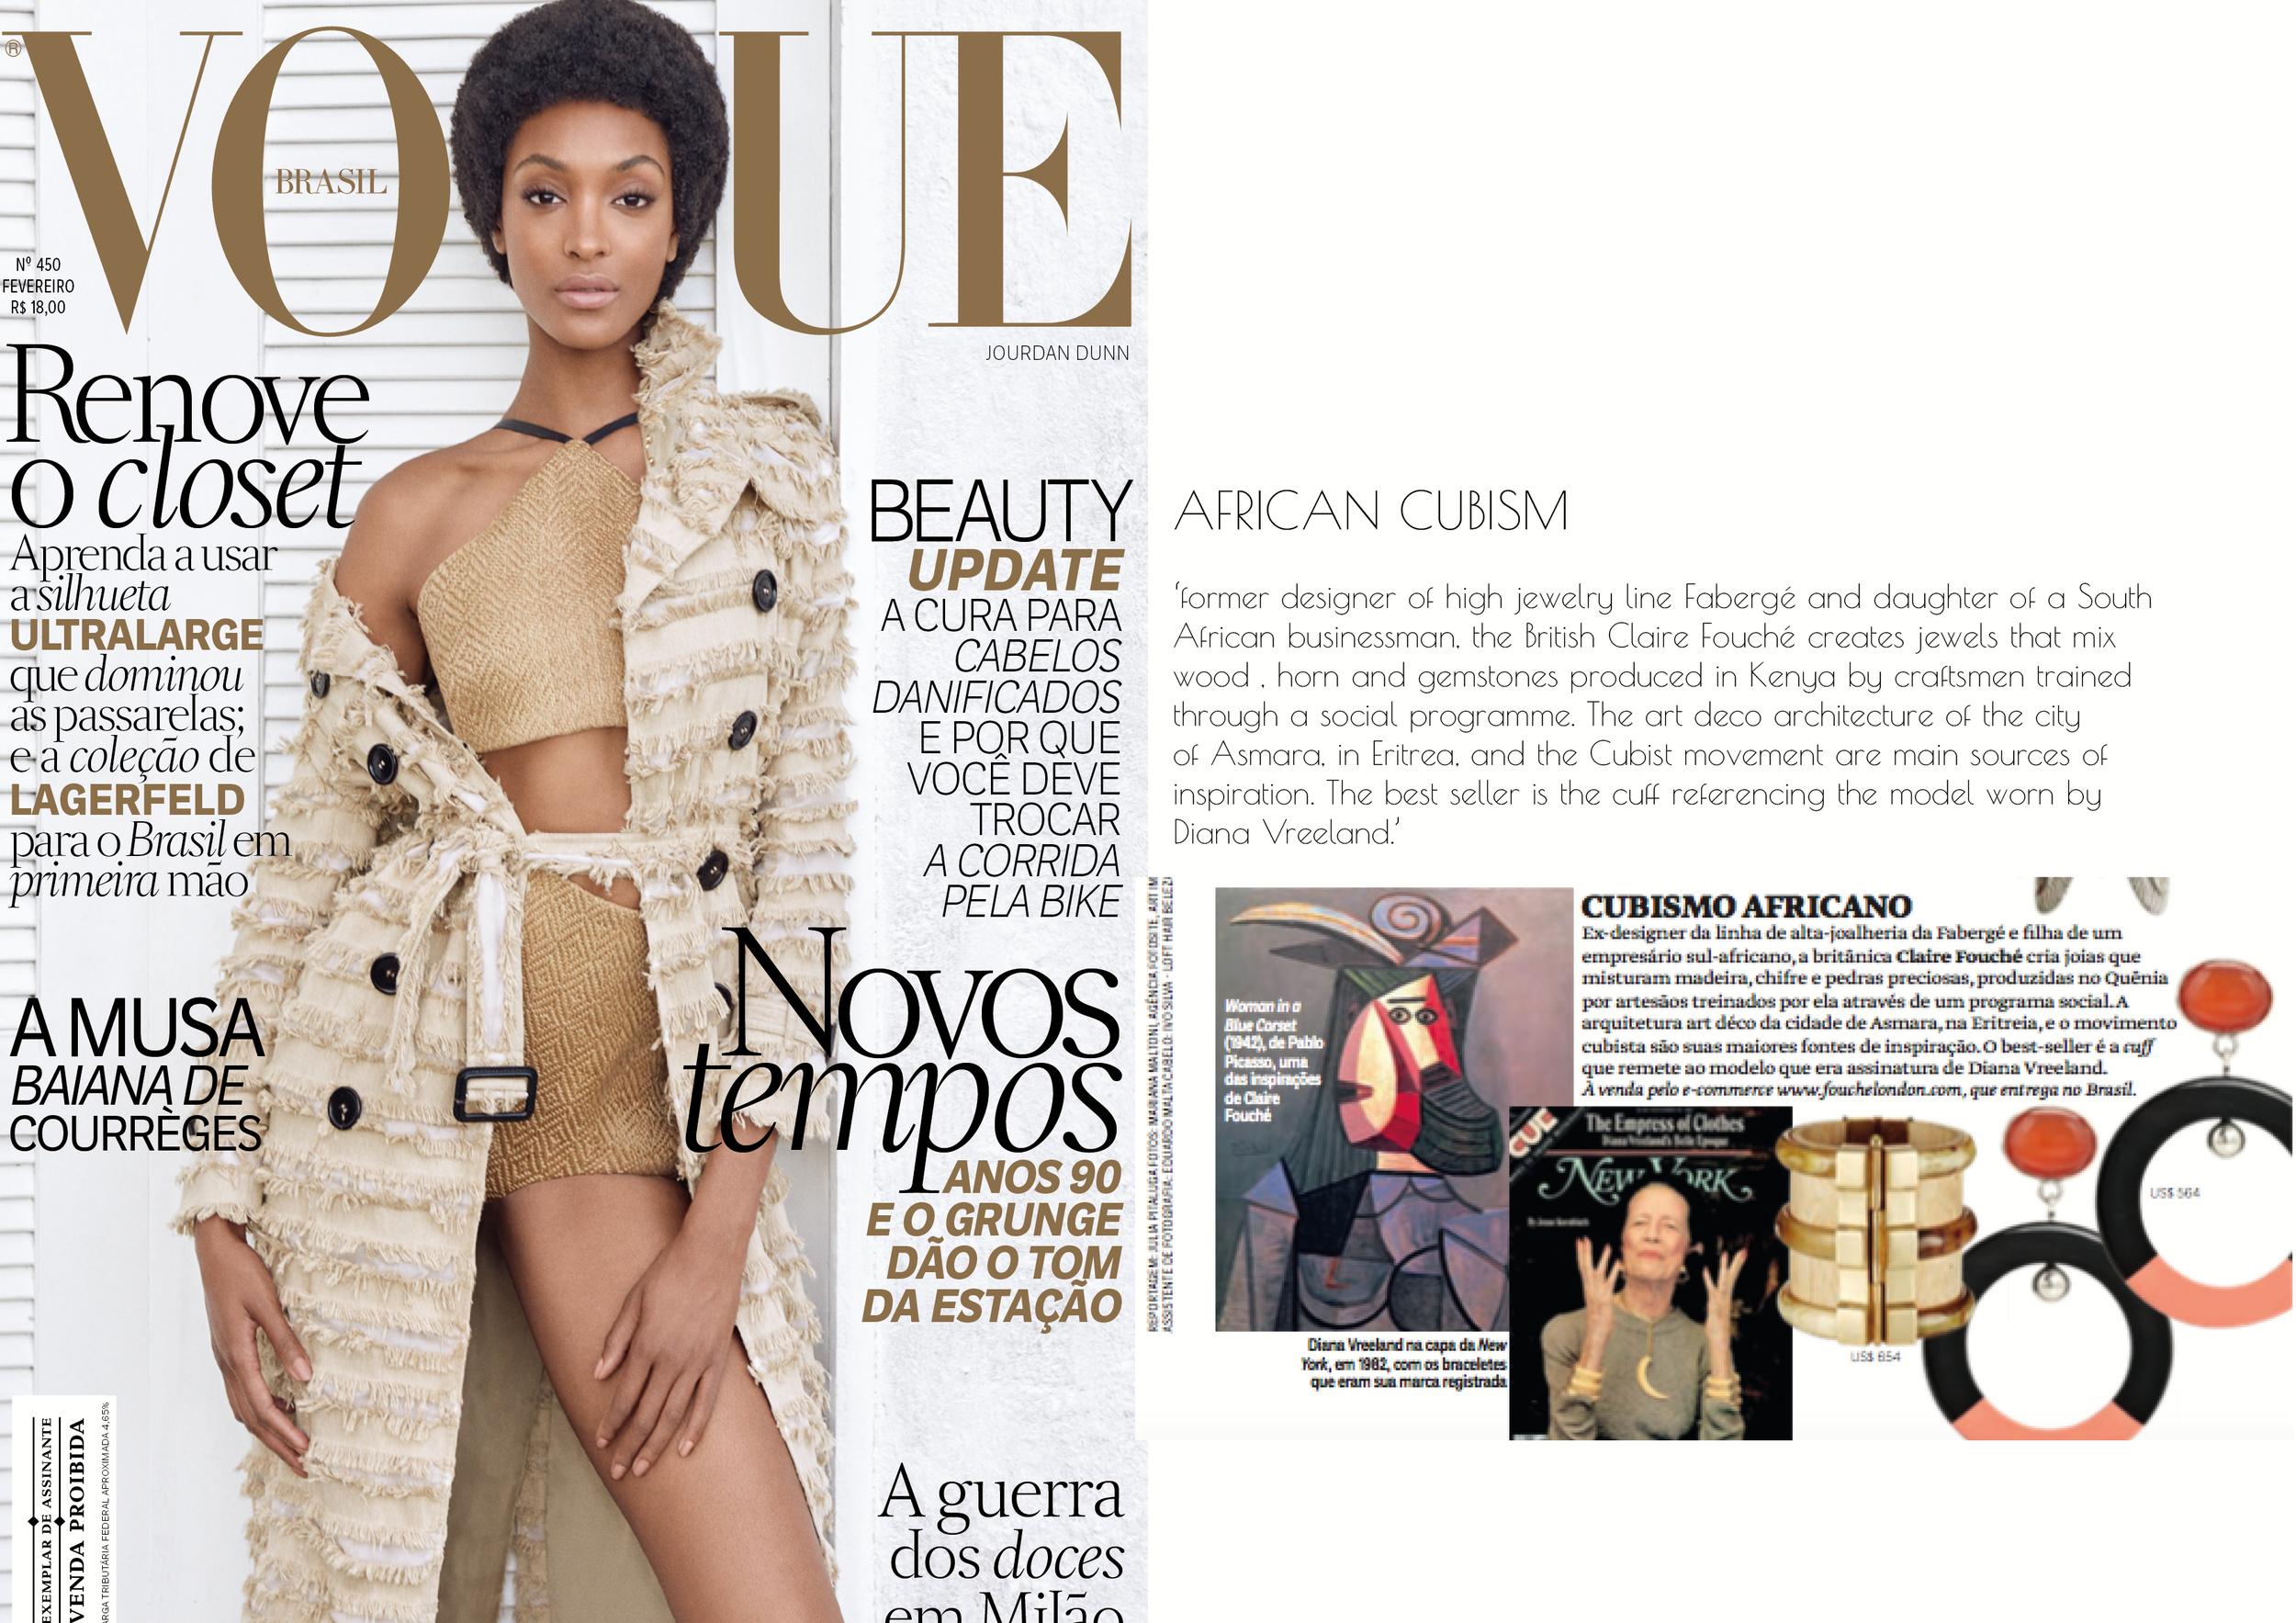 Vogue Brazil - February